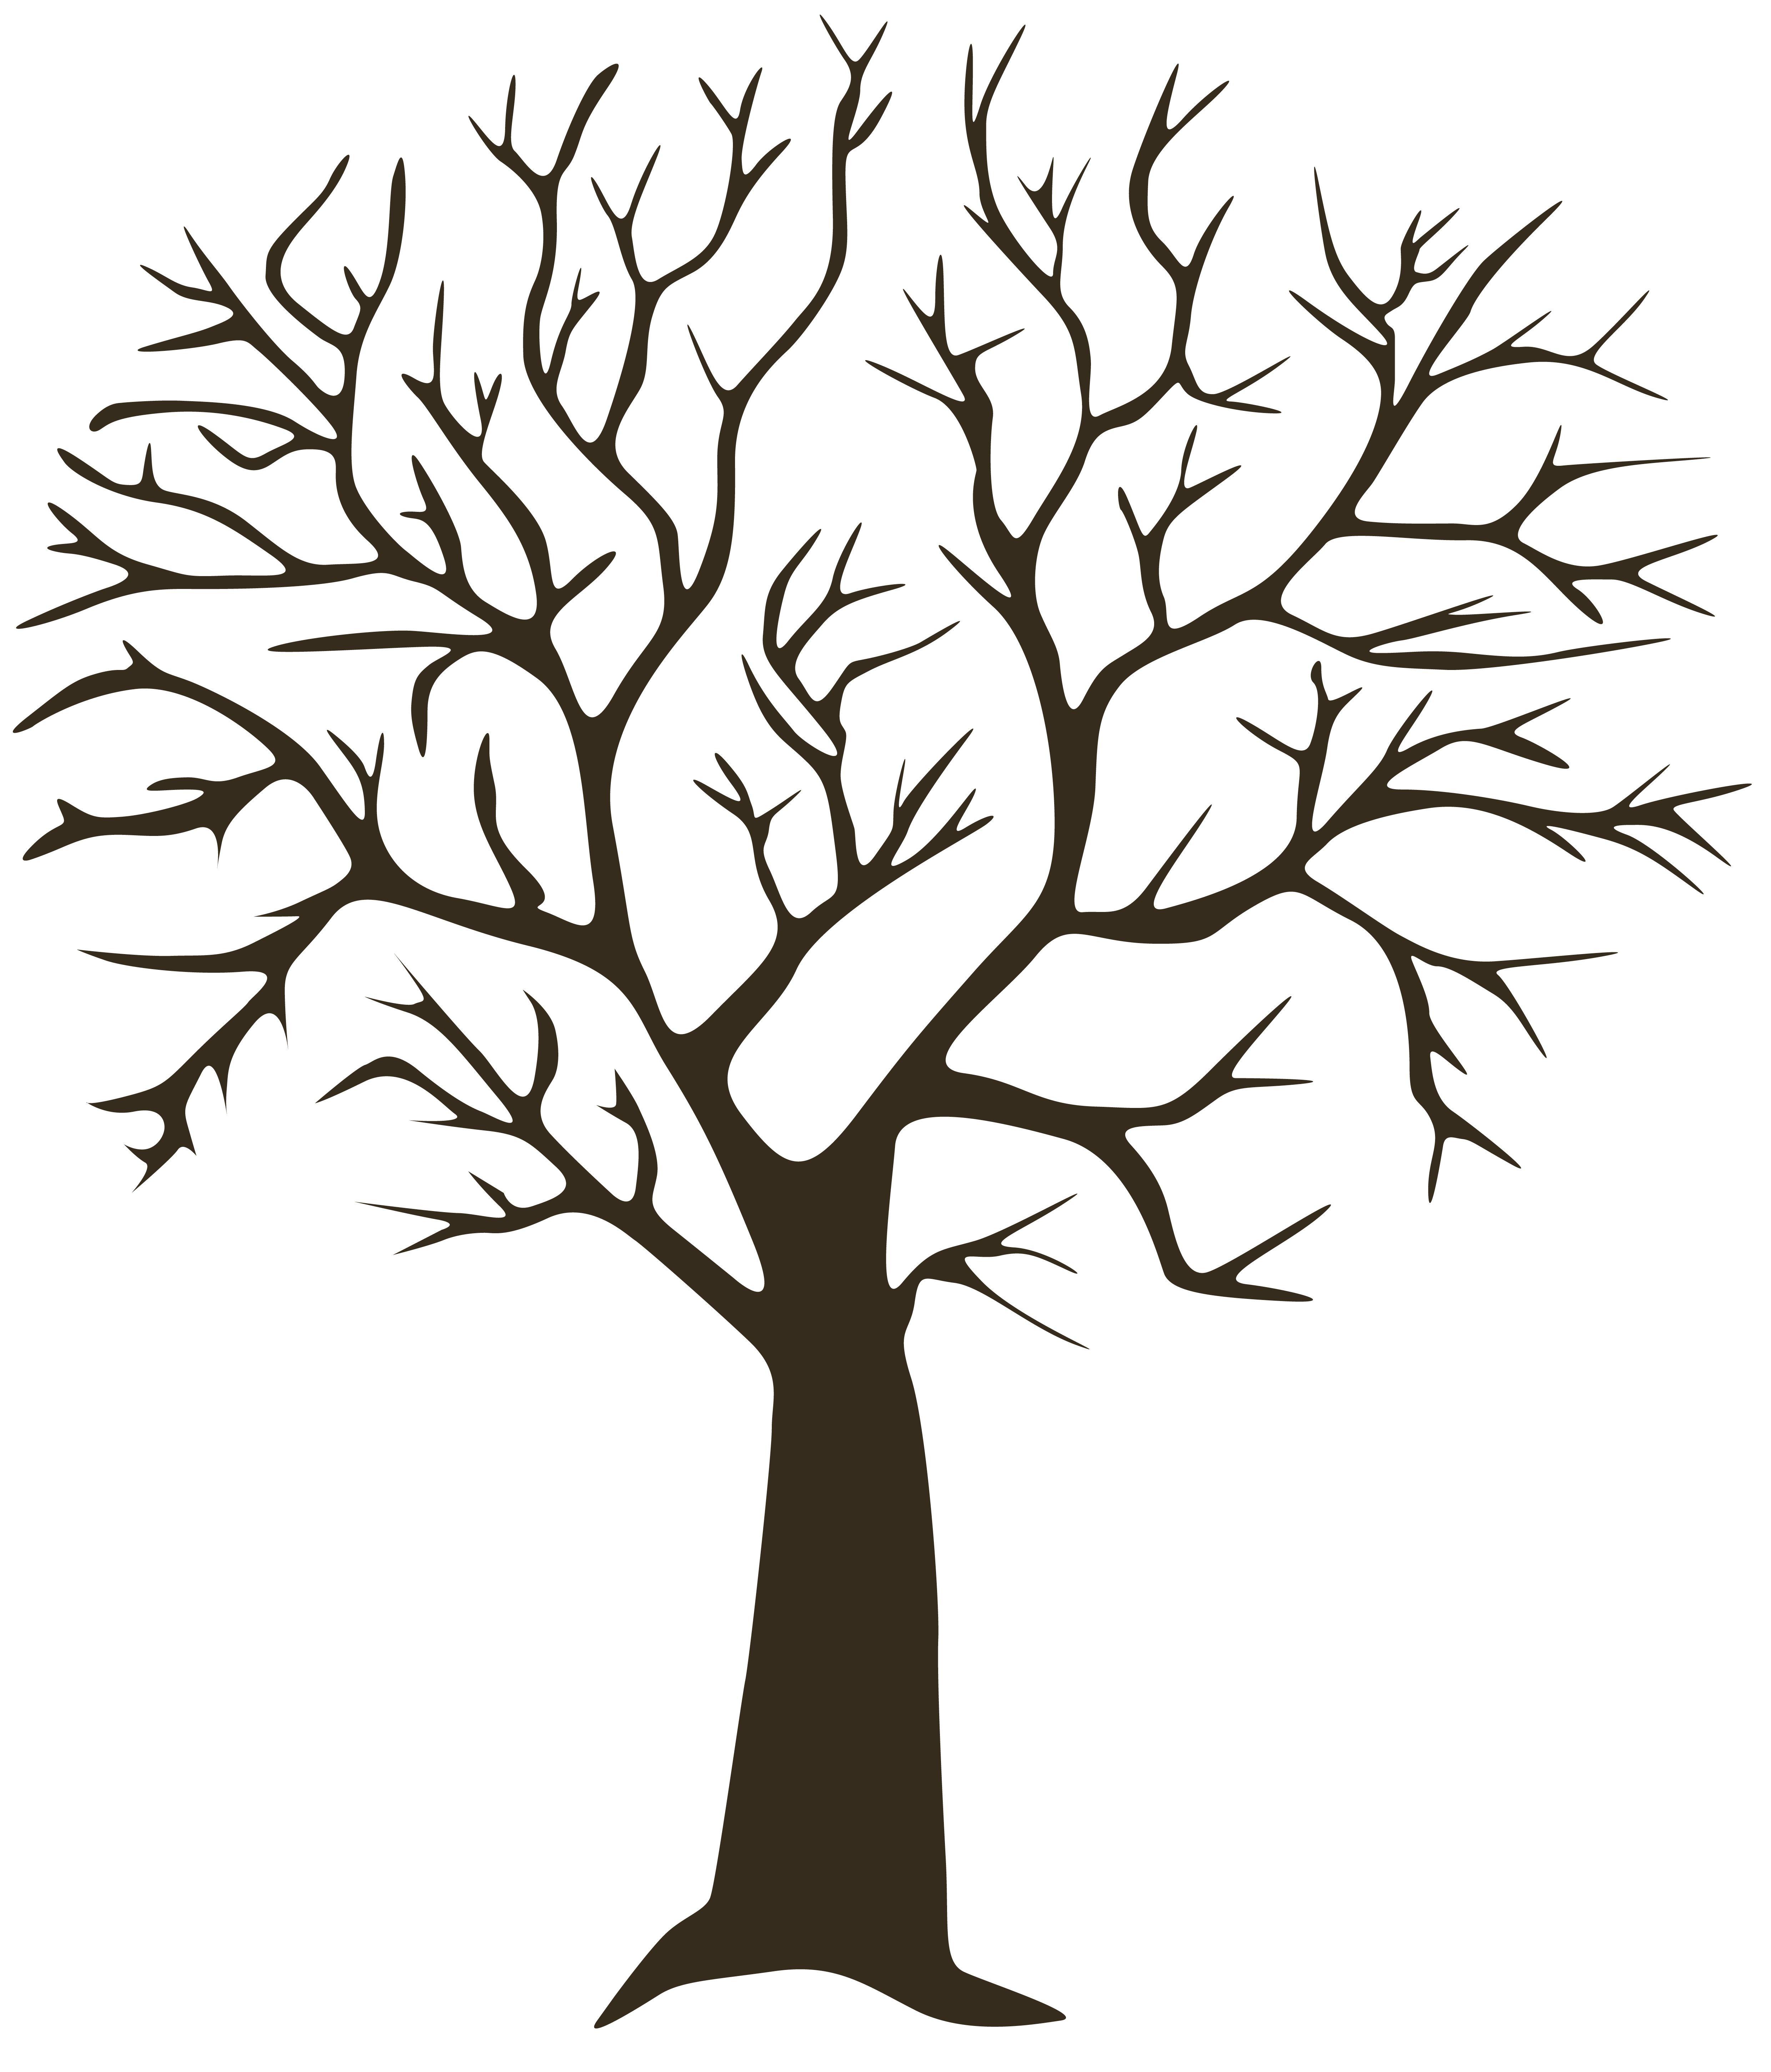 arbre empreintes t l charger gratuitement wedding pinterest empreinte correspondant. Black Bedroom Furniture Sets. Home Design Ideas